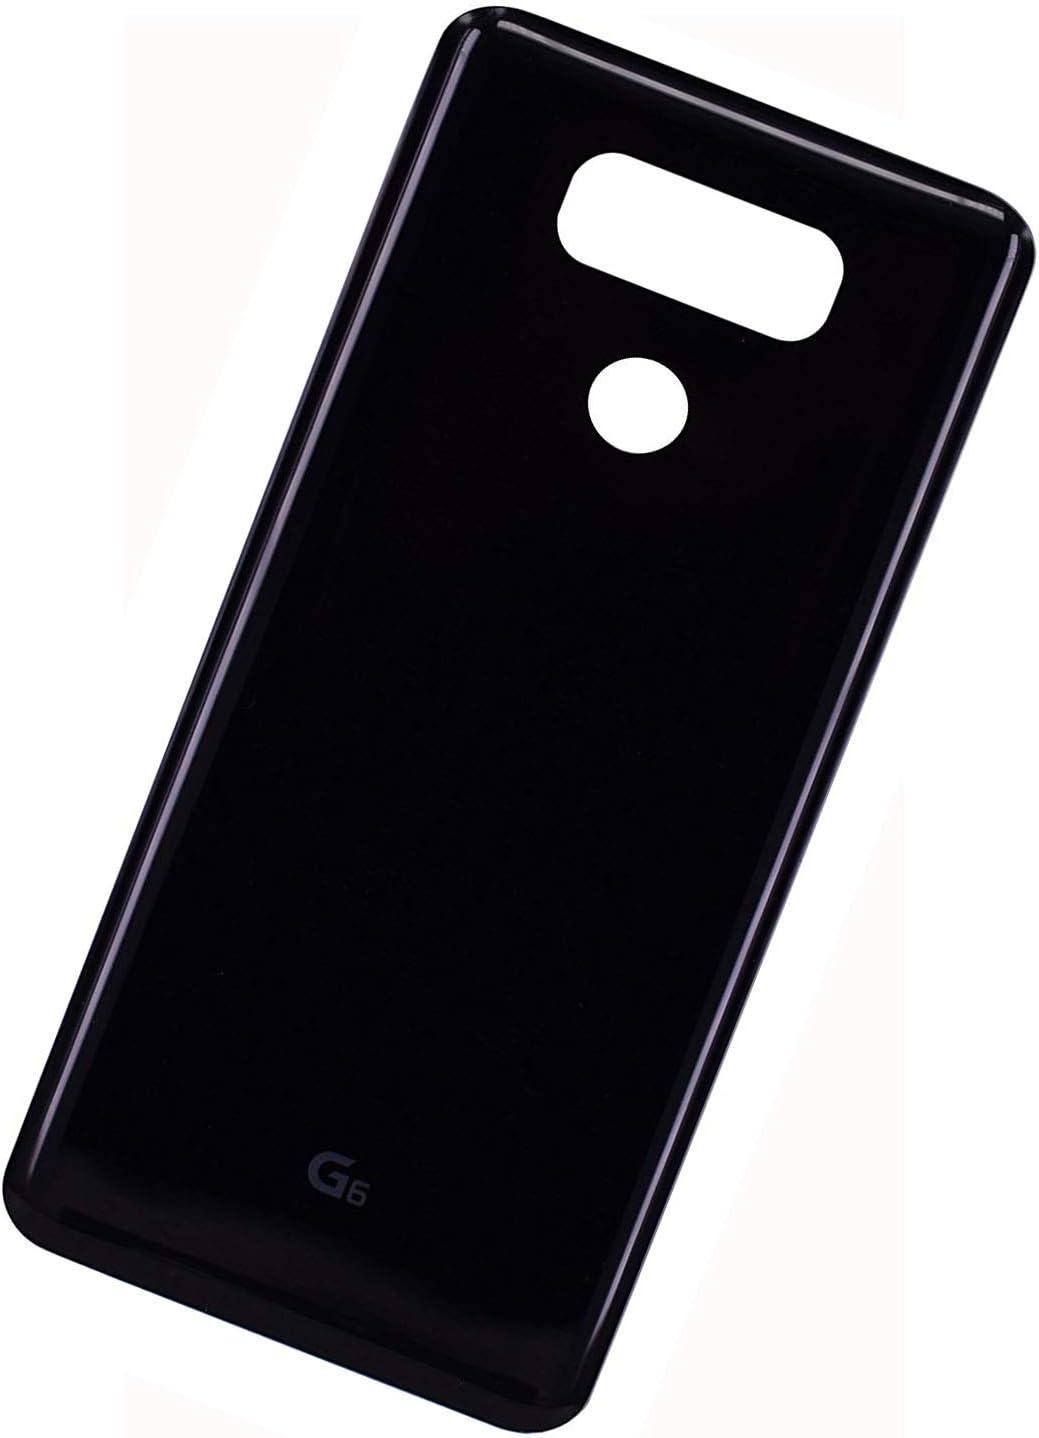 Tapa Trasera LG G6 H870 Ls993 H872 H871 Vs988 negro